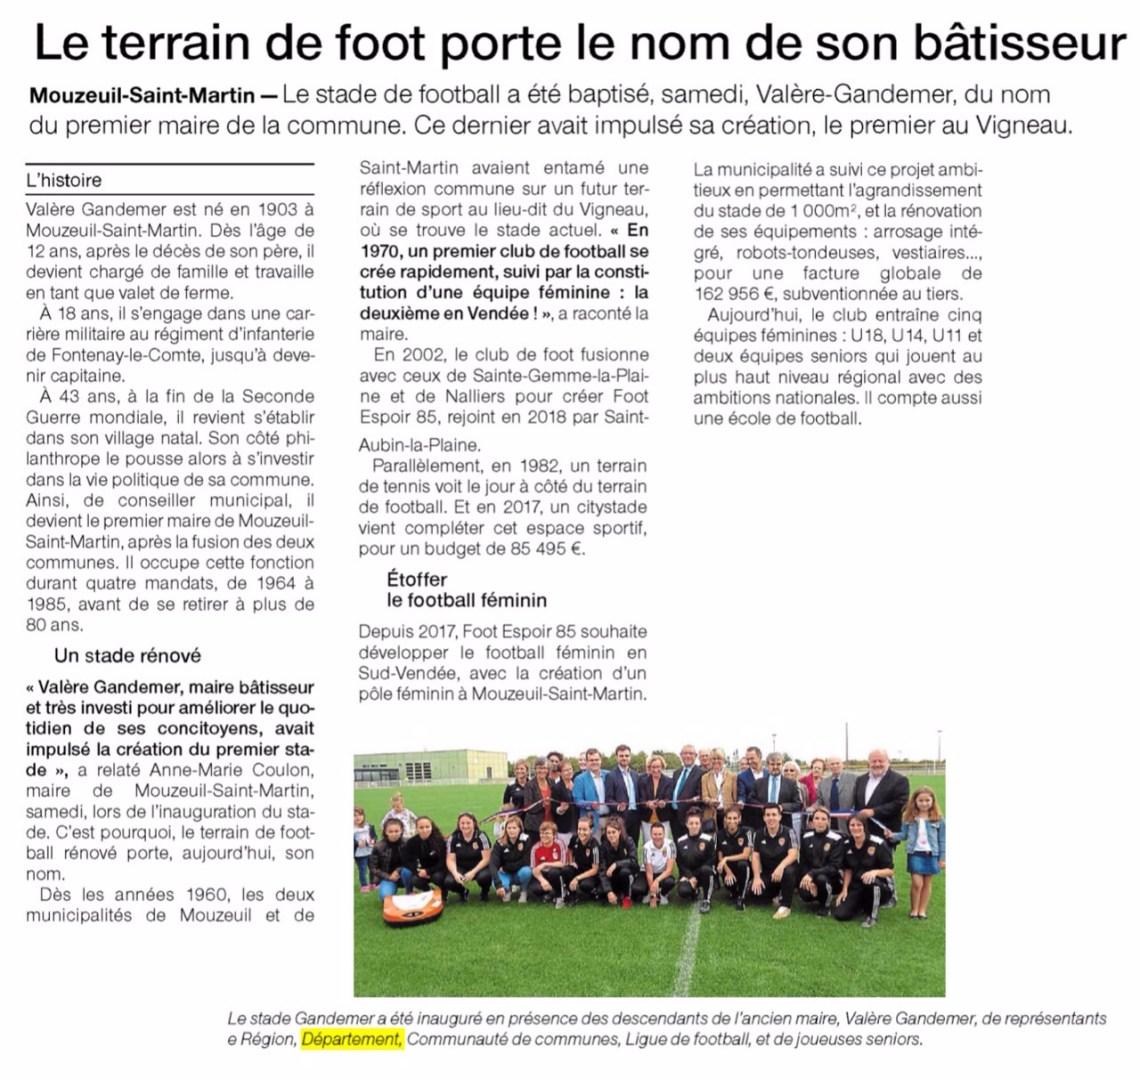 Inauguration du terrain de foot de Mouzeuil-Saint-Martin